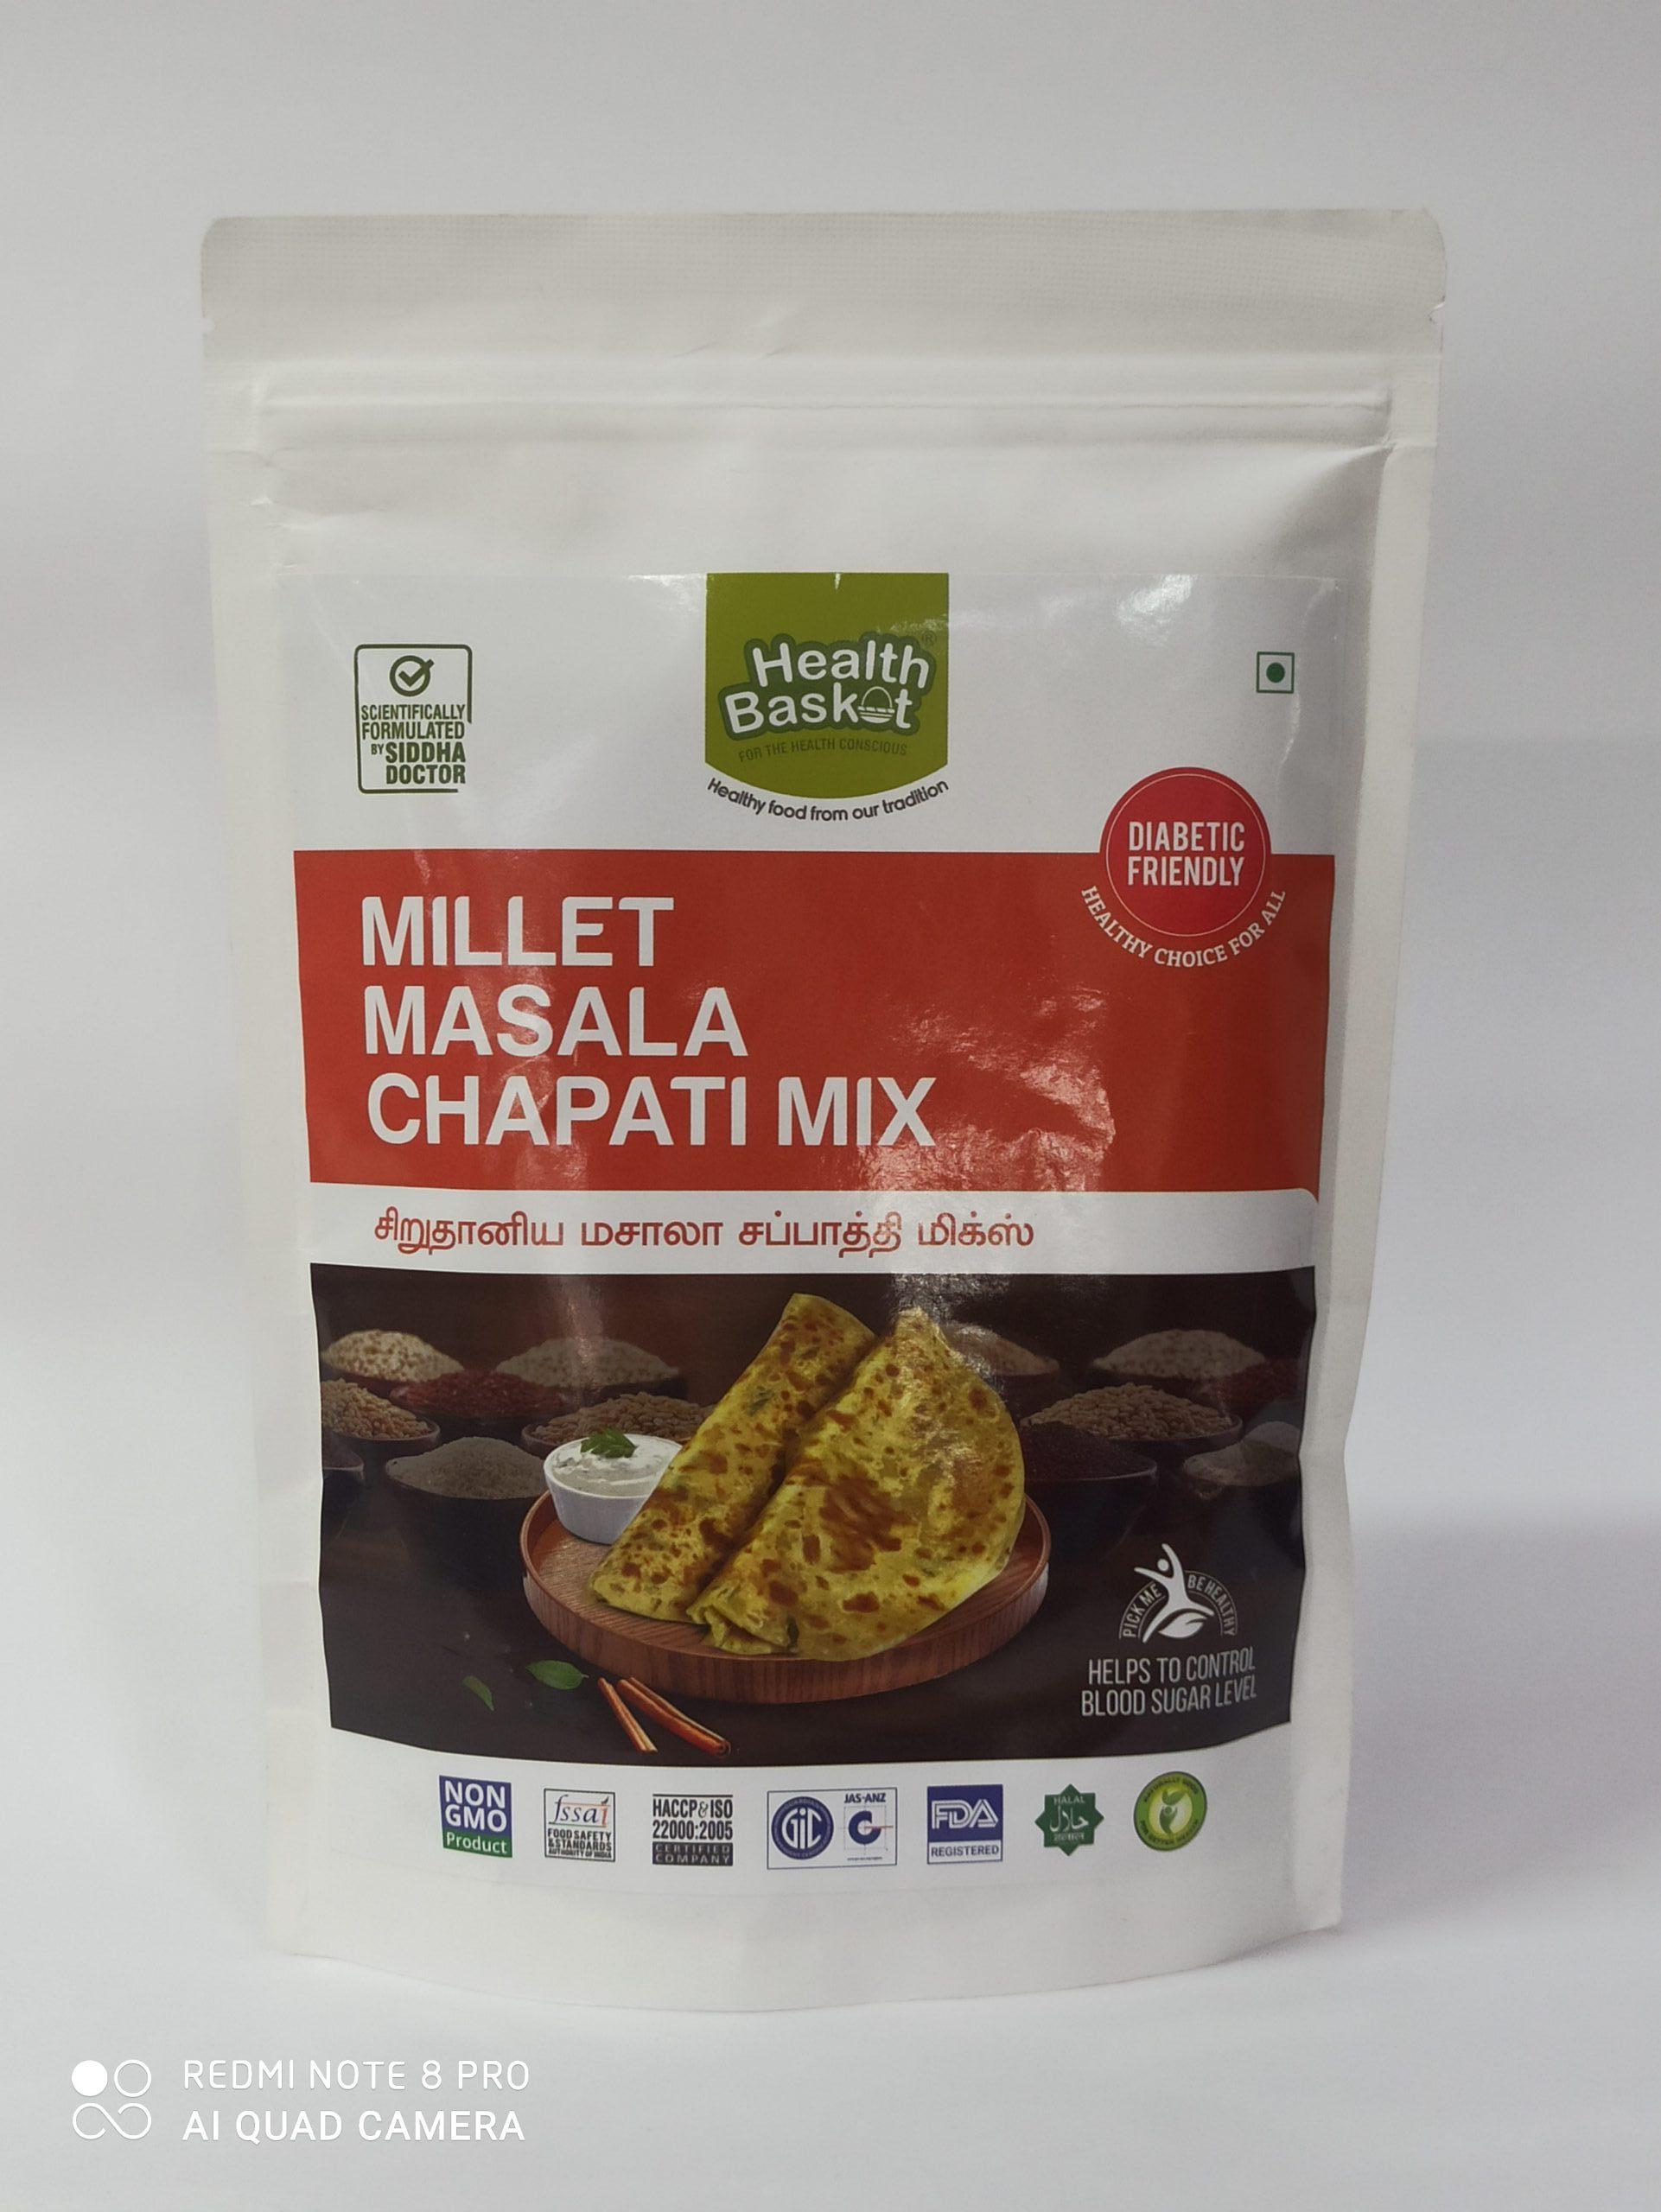 HEALTH BASKET MILLET MASALA CHAPATI MIX 500GM